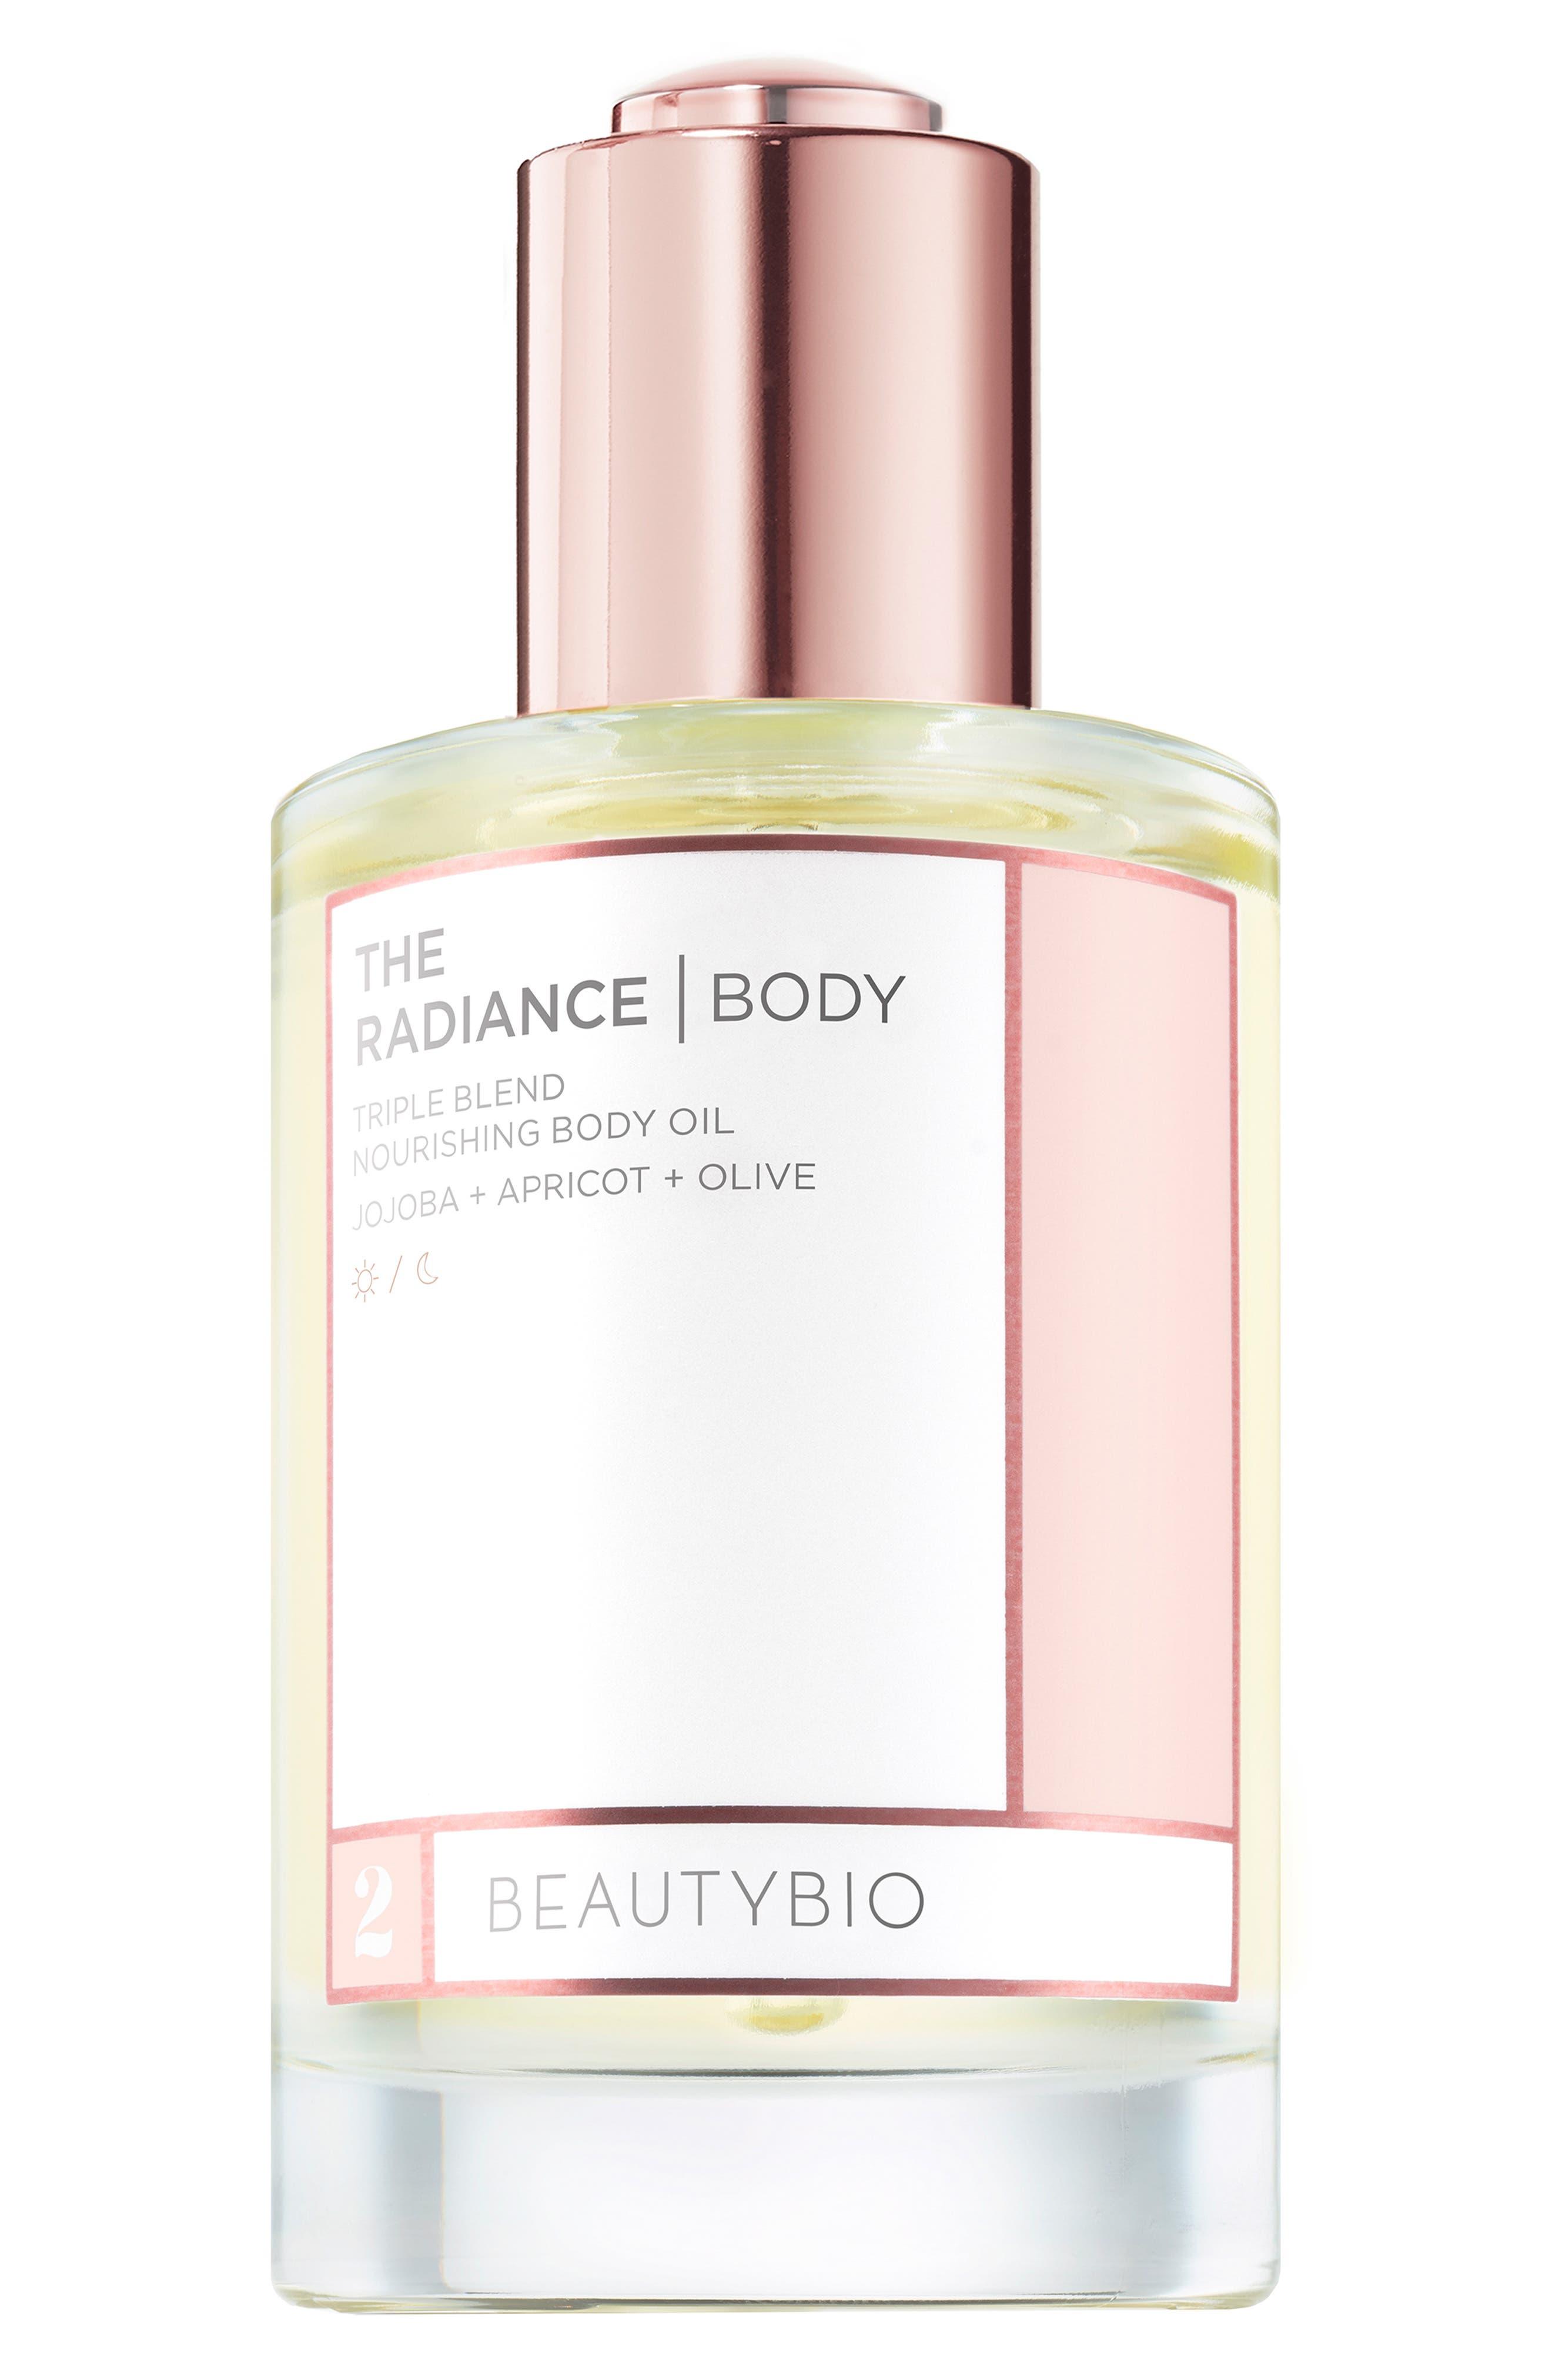 The Radiance Body Triple Blend Nourishing Body Oil